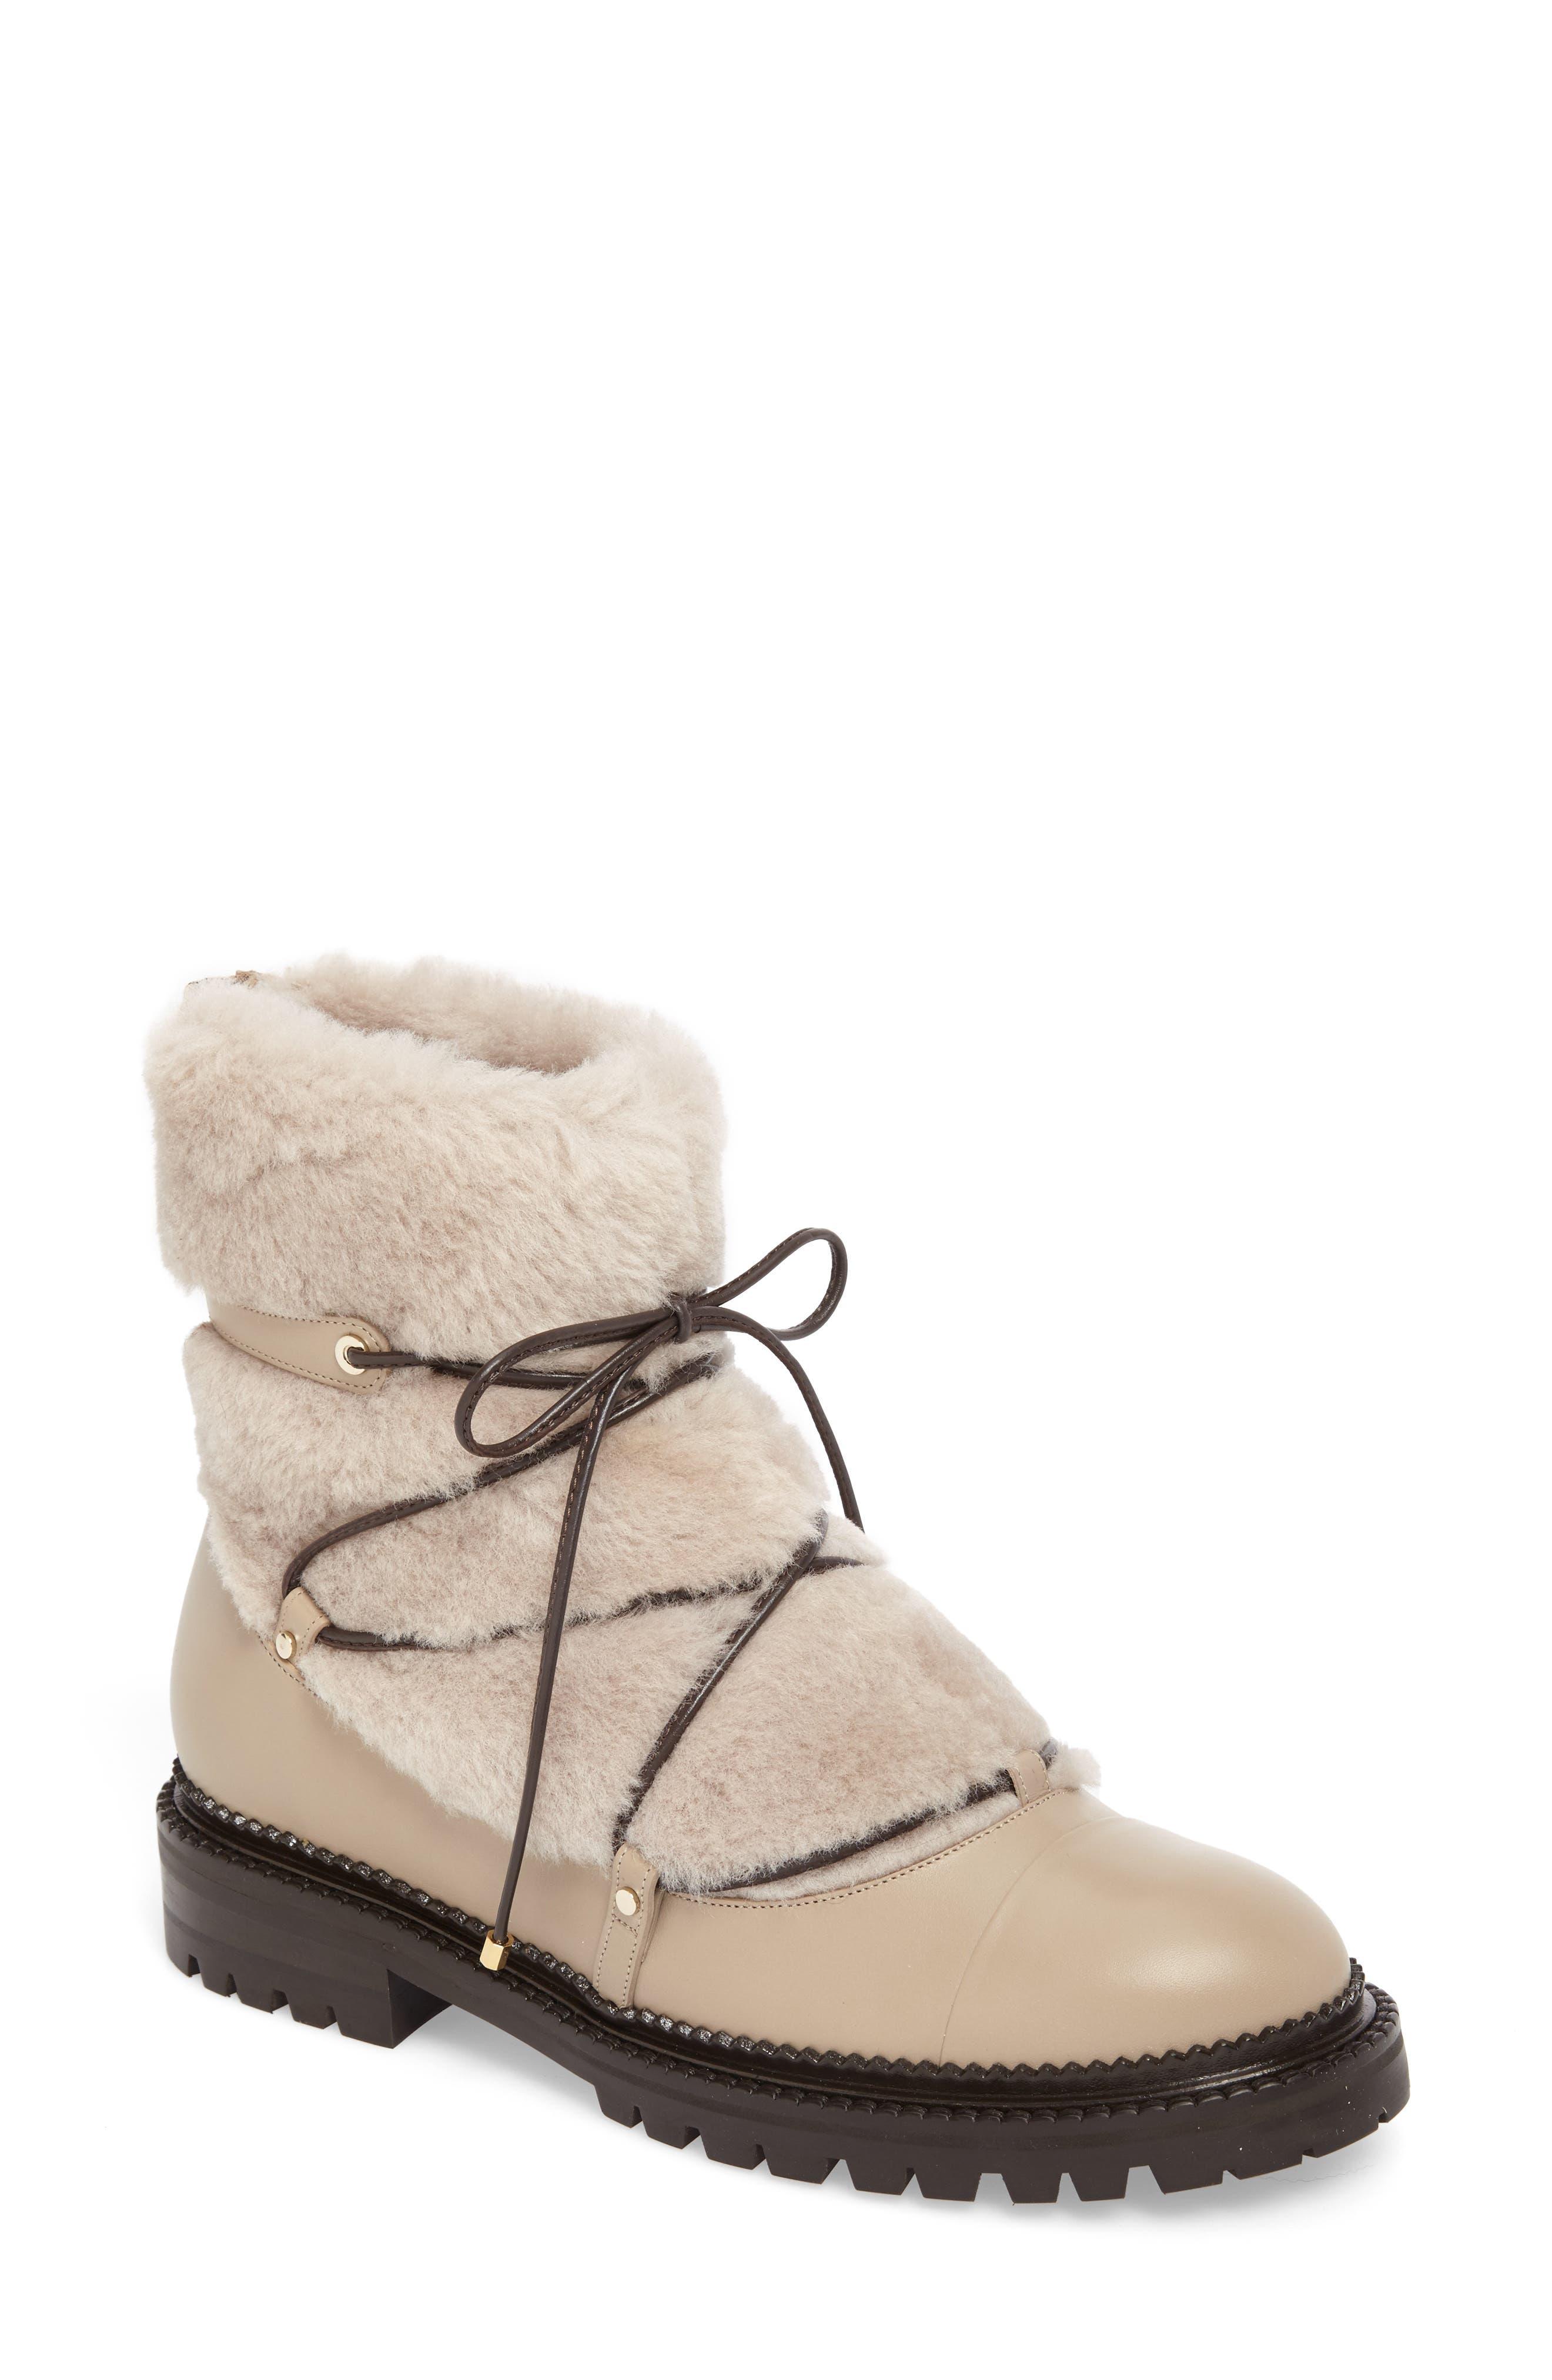 Darcie Genuine Shearling Boot,                             Main thumbnail 1, color,                             Chai